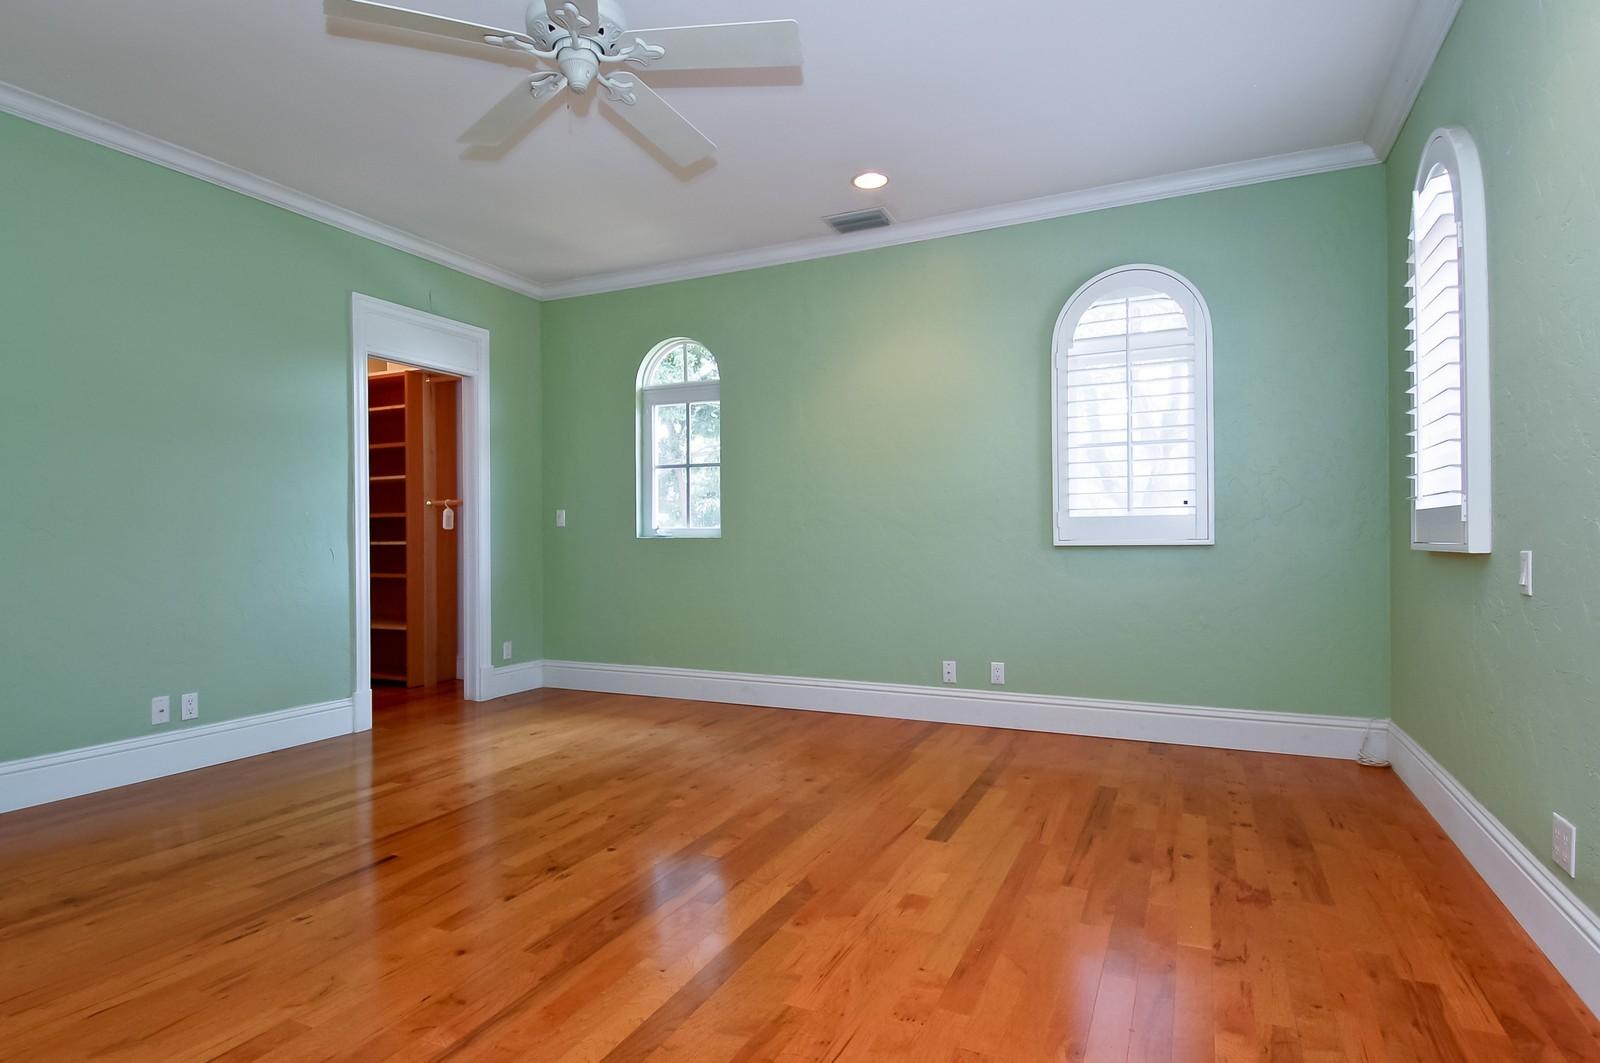 Real Estate Photography - 899 Azalea St, Boca Raton, FL, 33486 - Master Bedroom